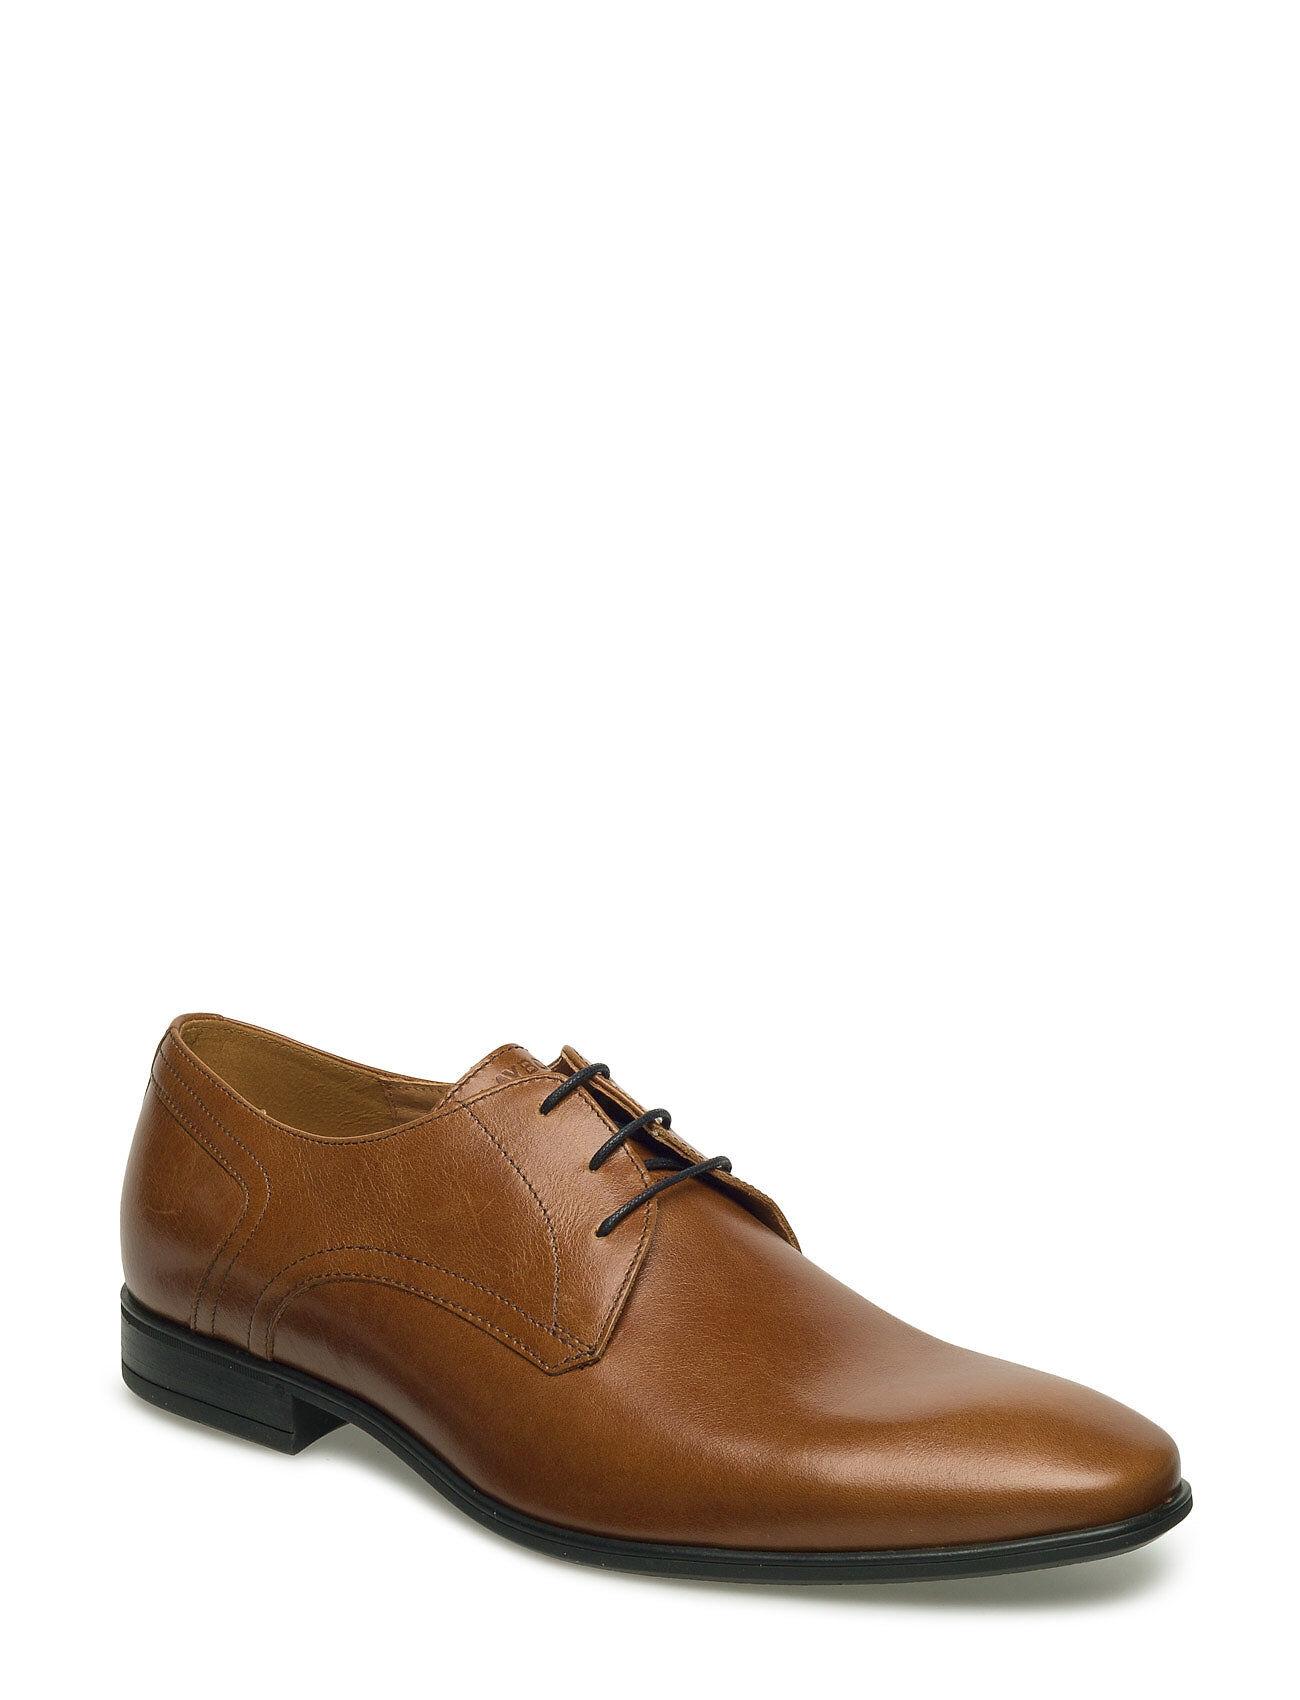 Playboy Footwear 7408 Shoes Business Laced Shoes Ruskea Playboy Footwear